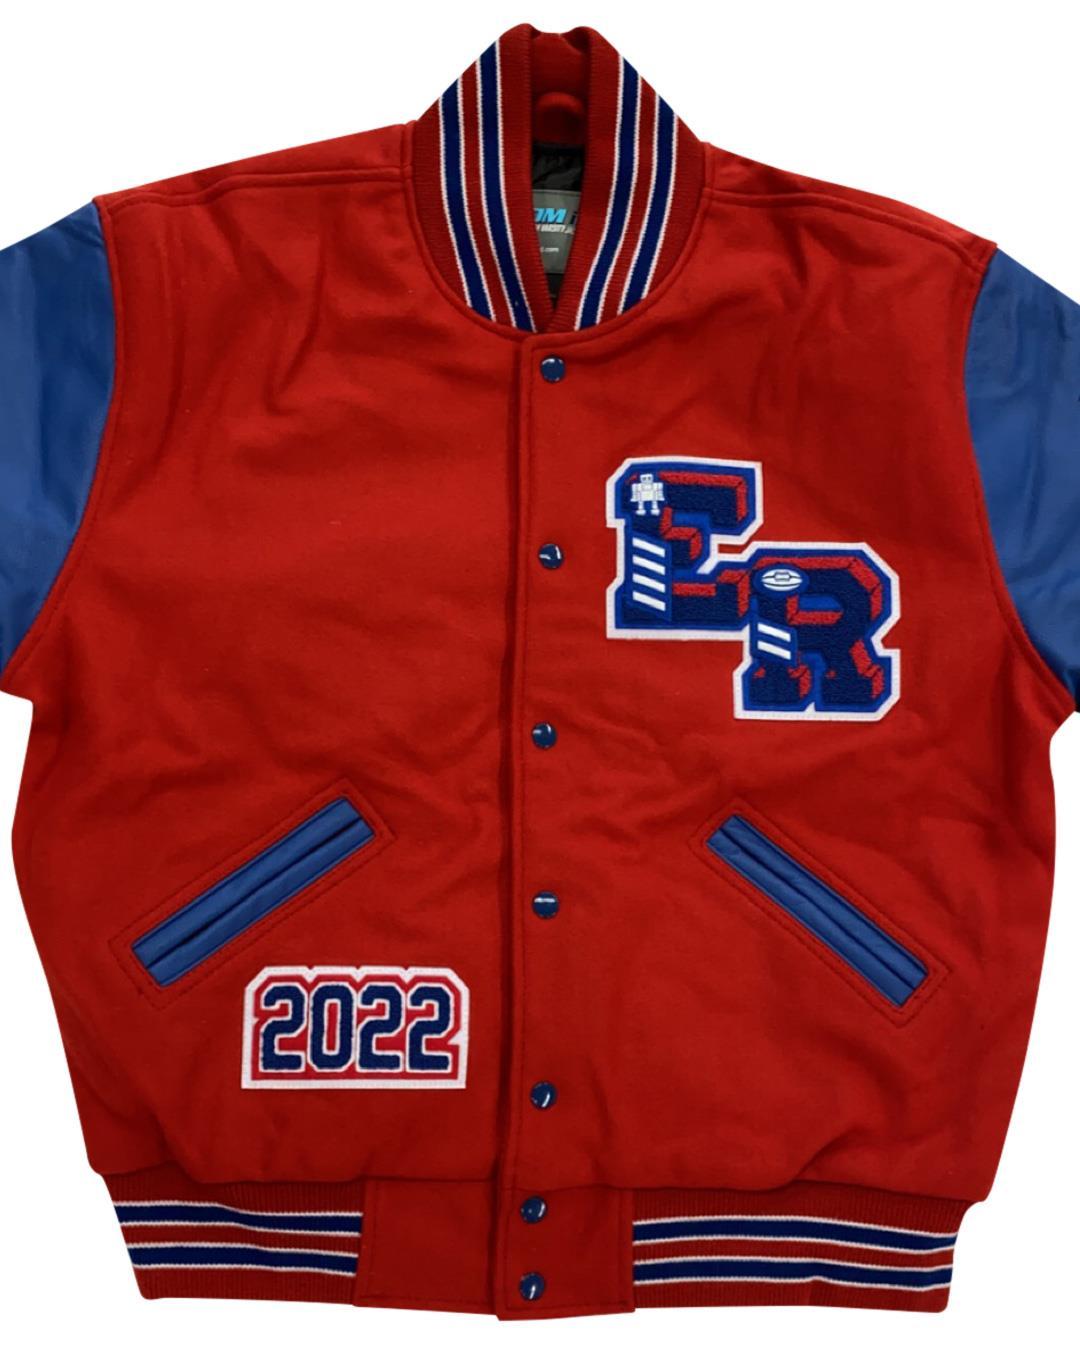 East Rankin Academy Letterman Jacket, Pelahatchie MS - Front